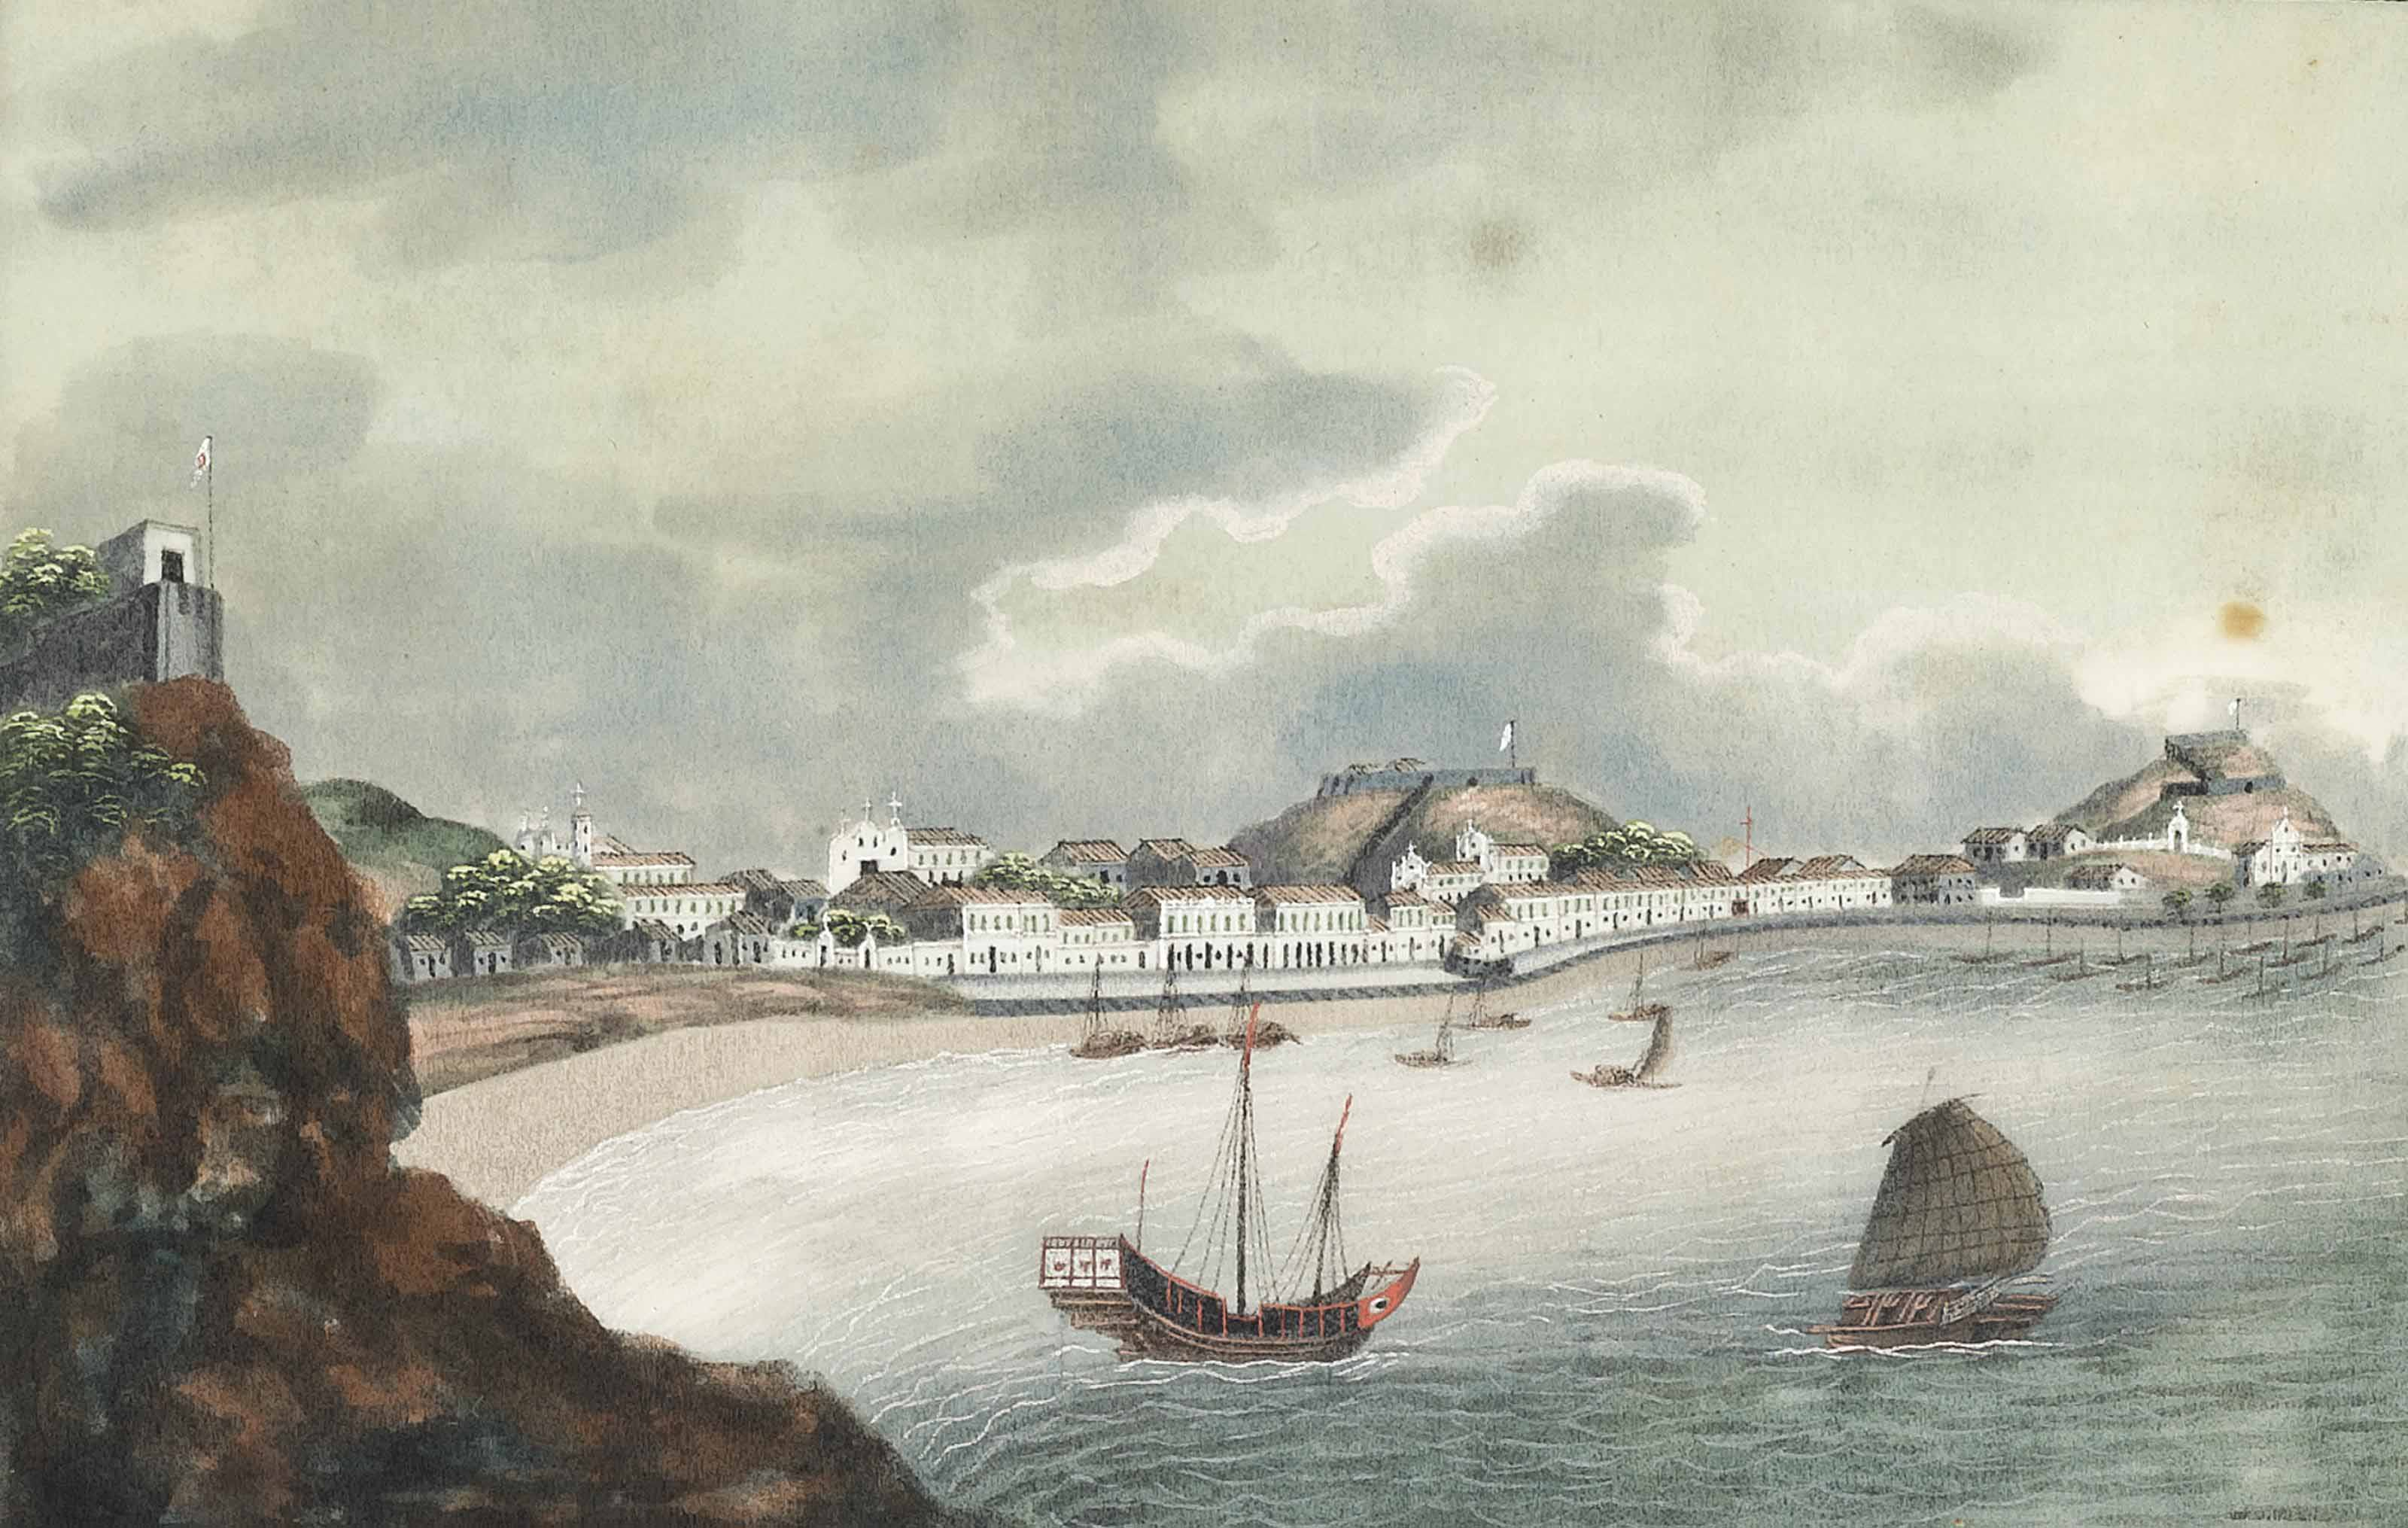 The Hongs at Canton; Whampoa Anchorage; The Praya Grande, Macao; and Bocca Tigris